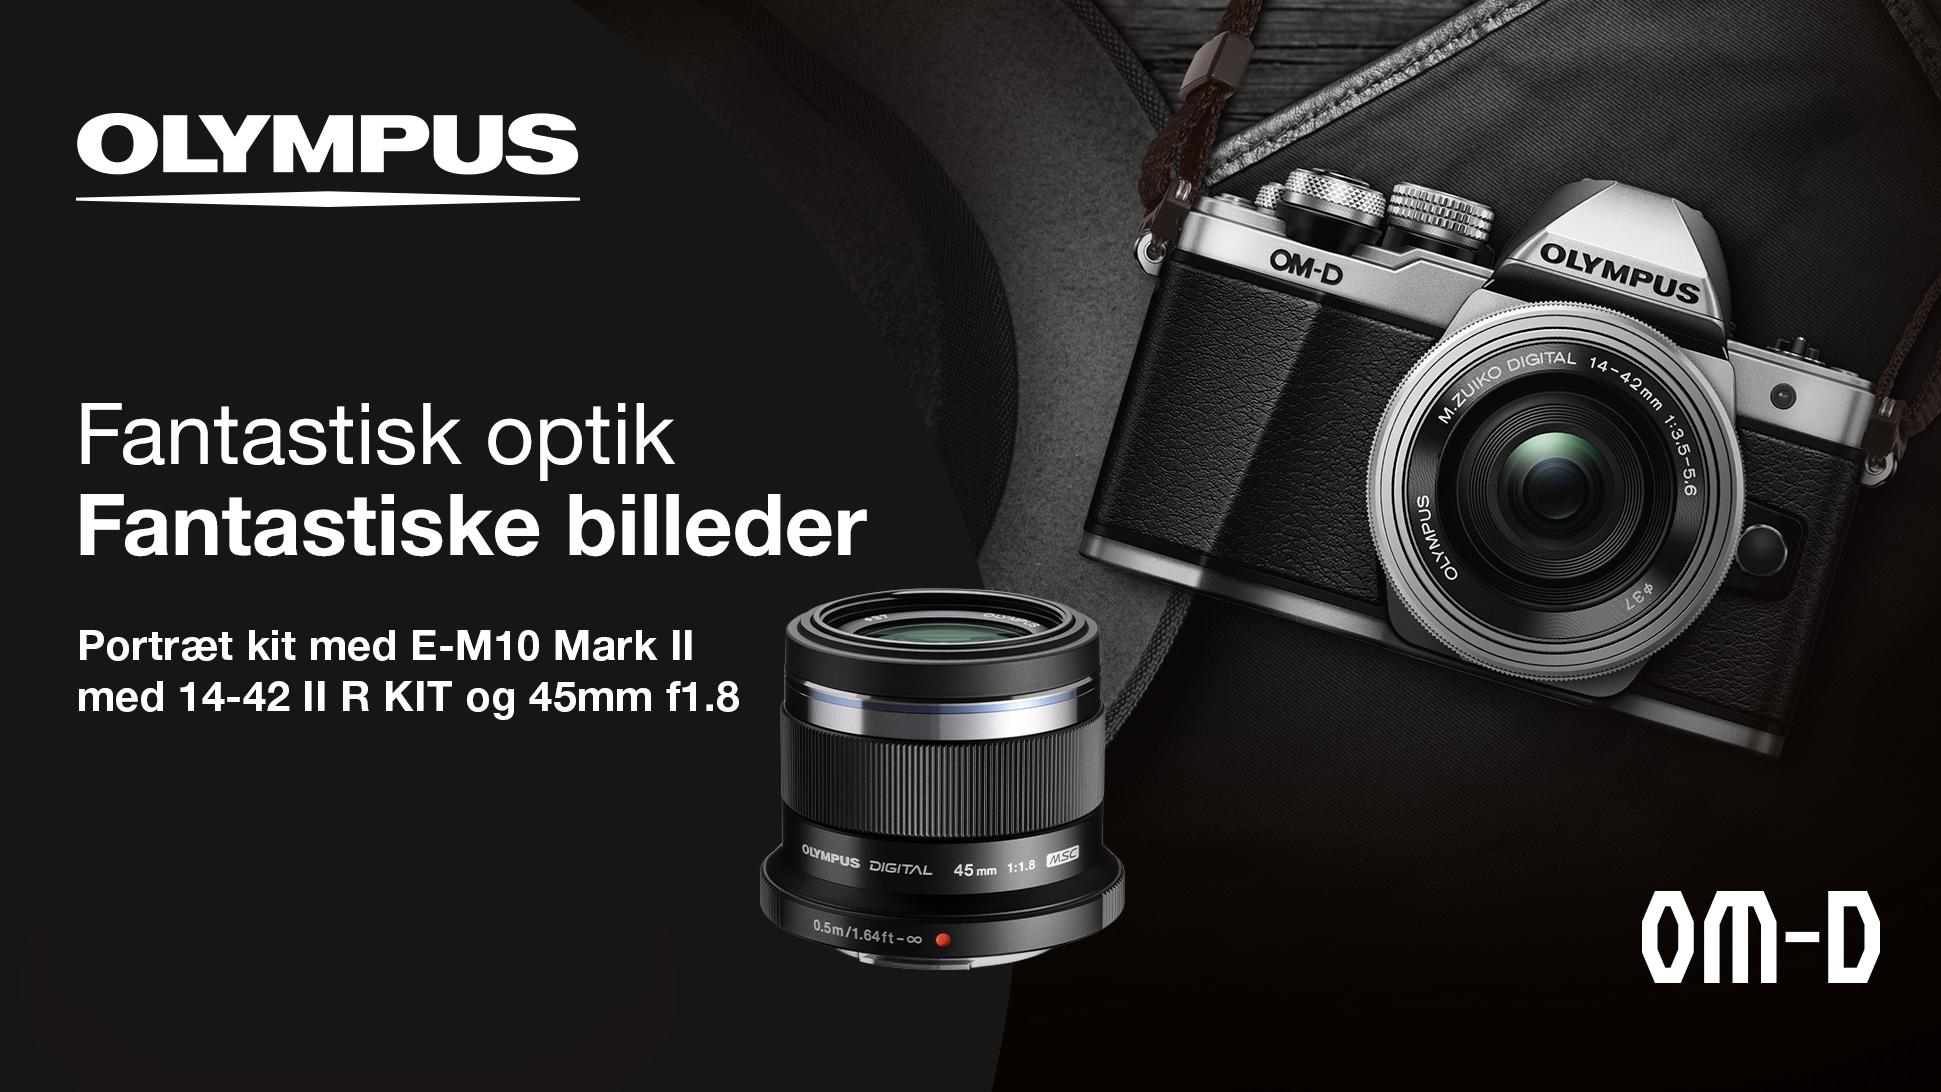 Olympus E-M10 mark II Portræt kit kampagne